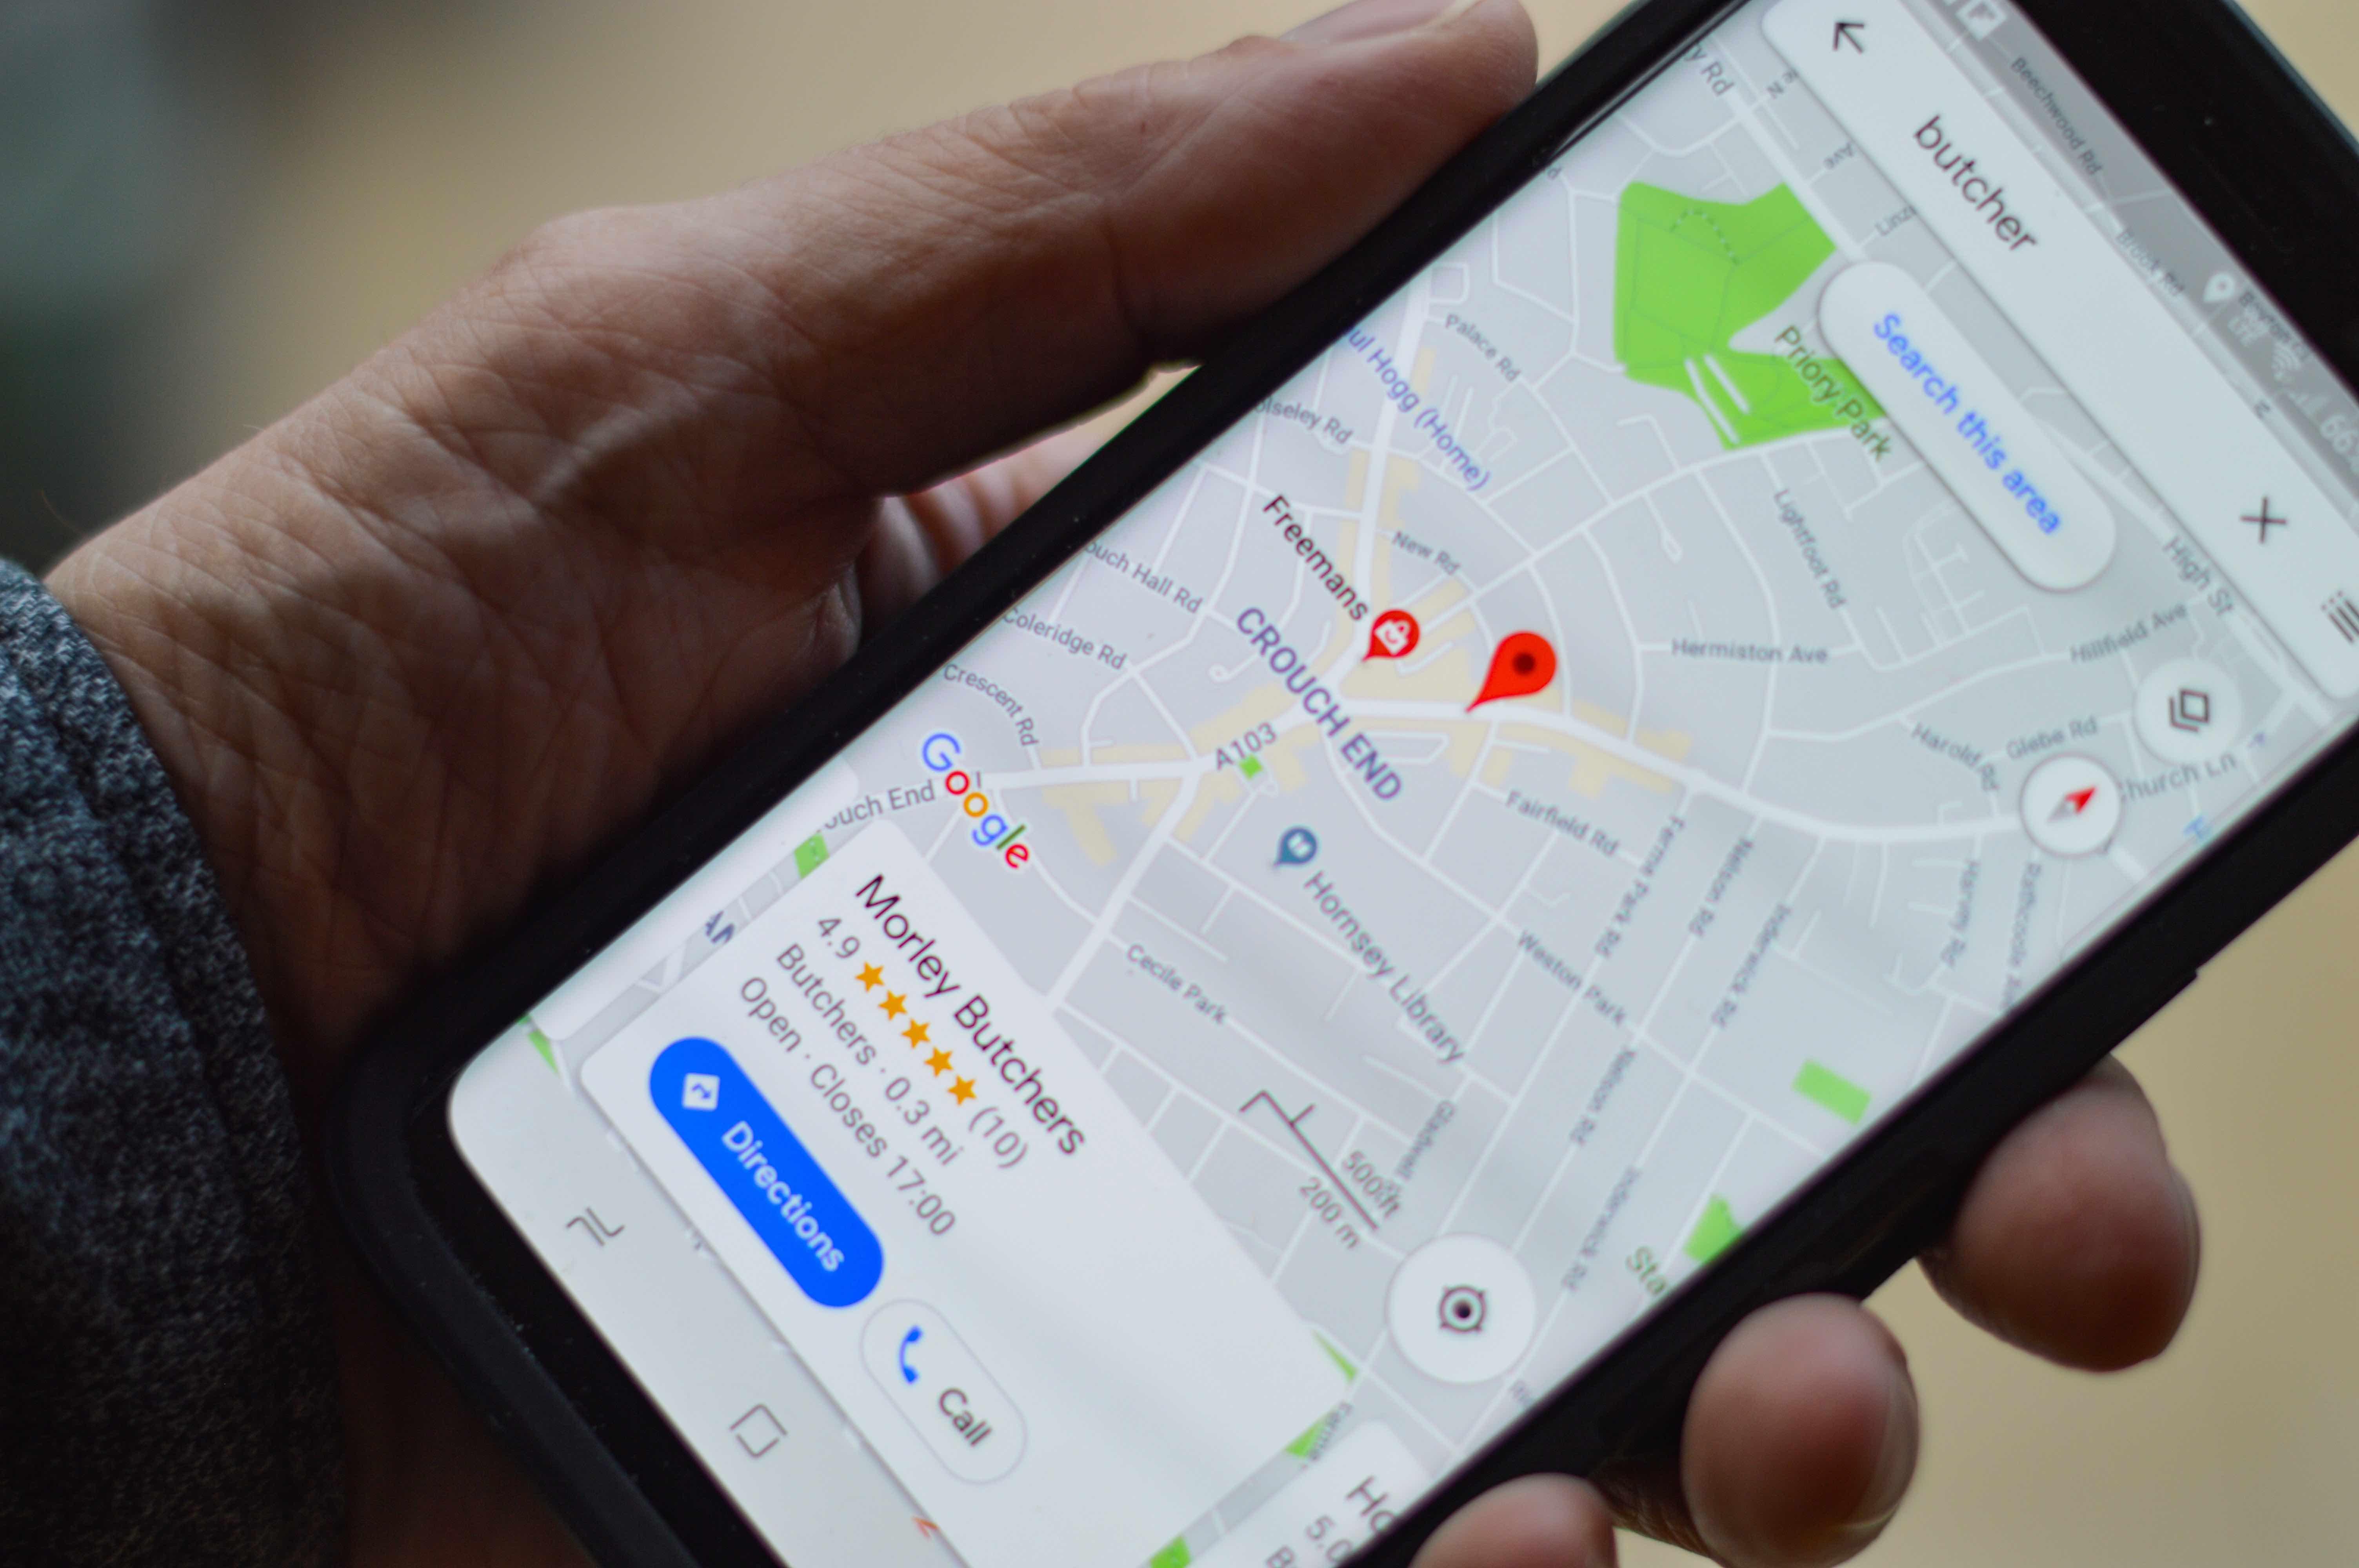 GPS 20190605 Geo Privacy ART henry-perks-unsplash